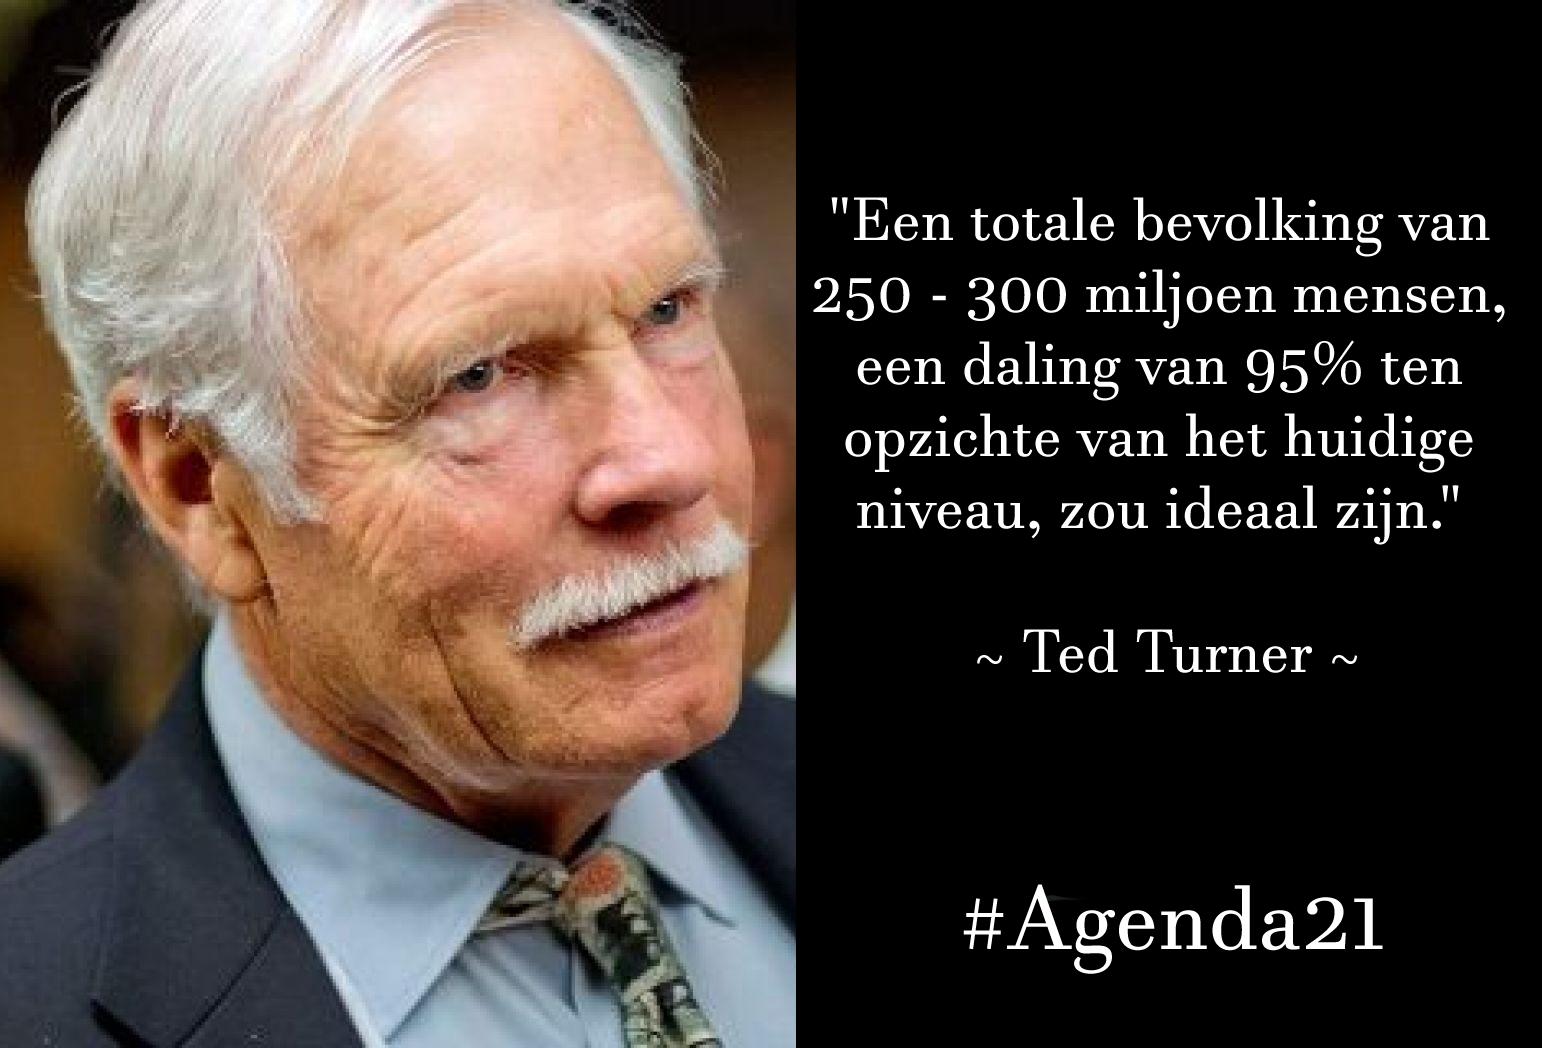 Agenda21-ted-turner